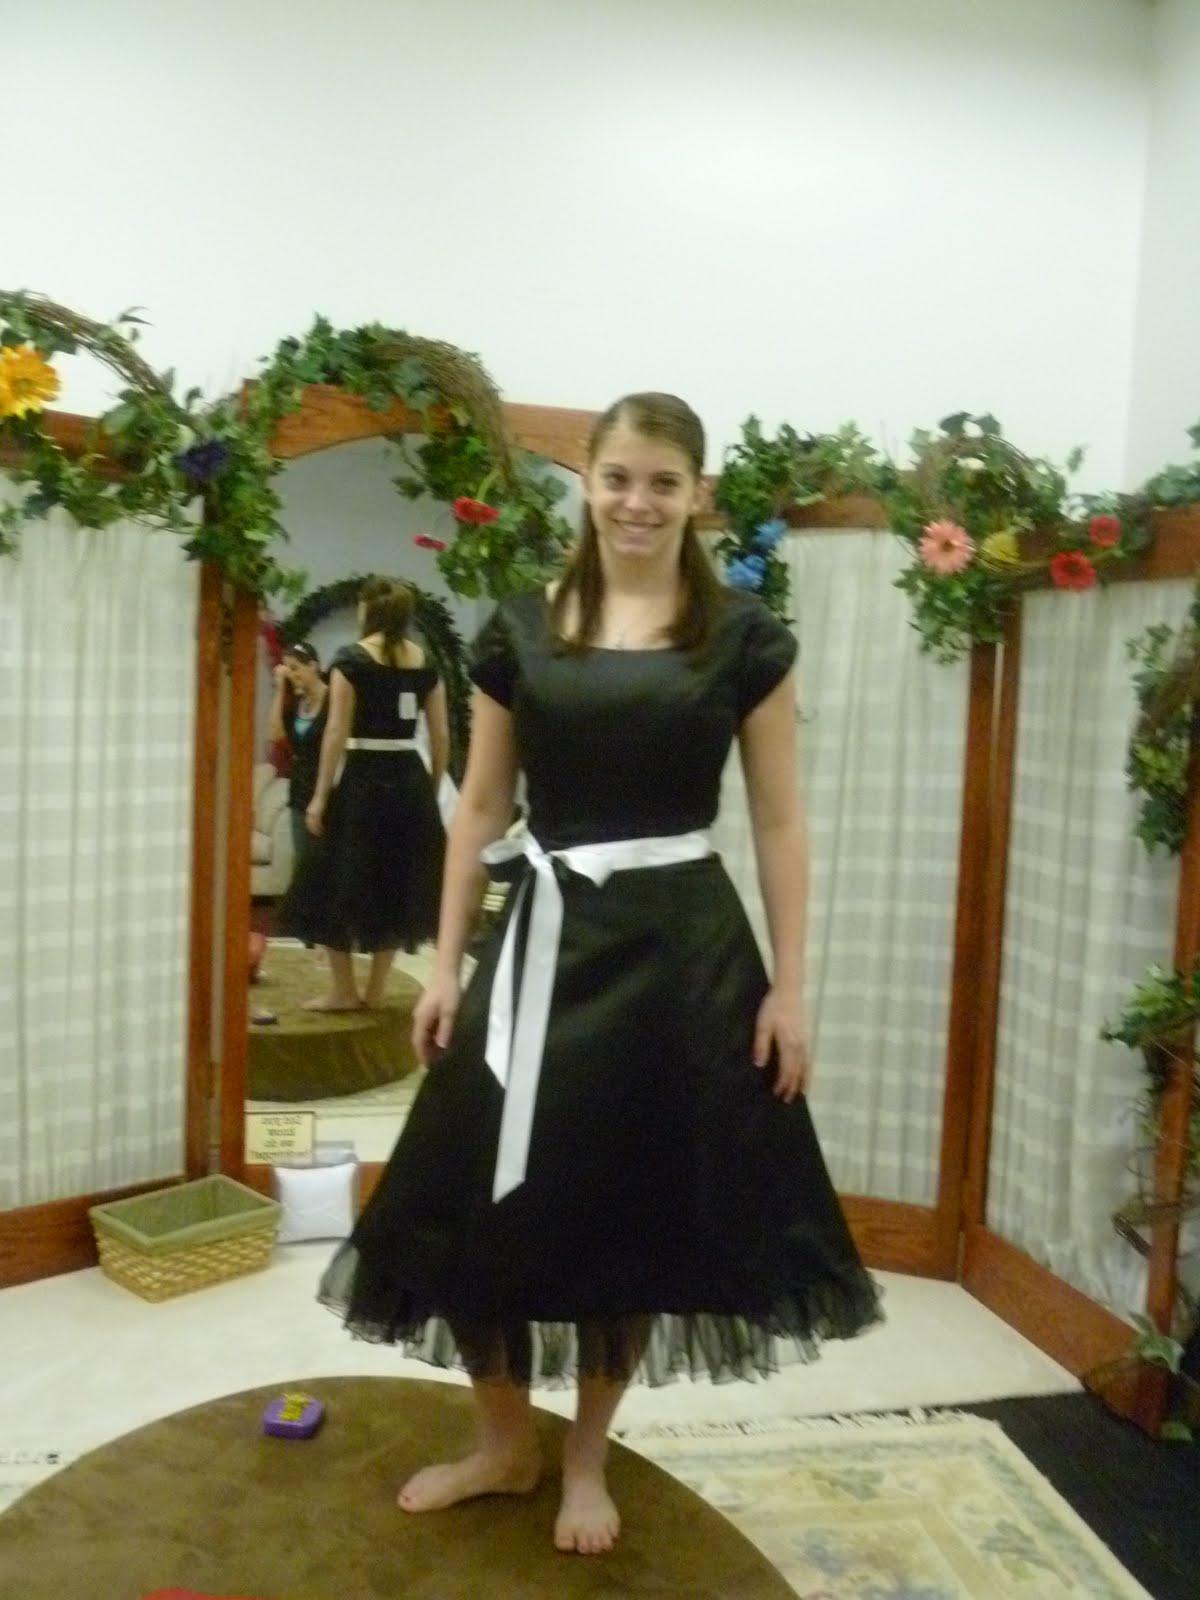 Boulevard Bridal has modest wedding dresses, modest prom & bridesmaids